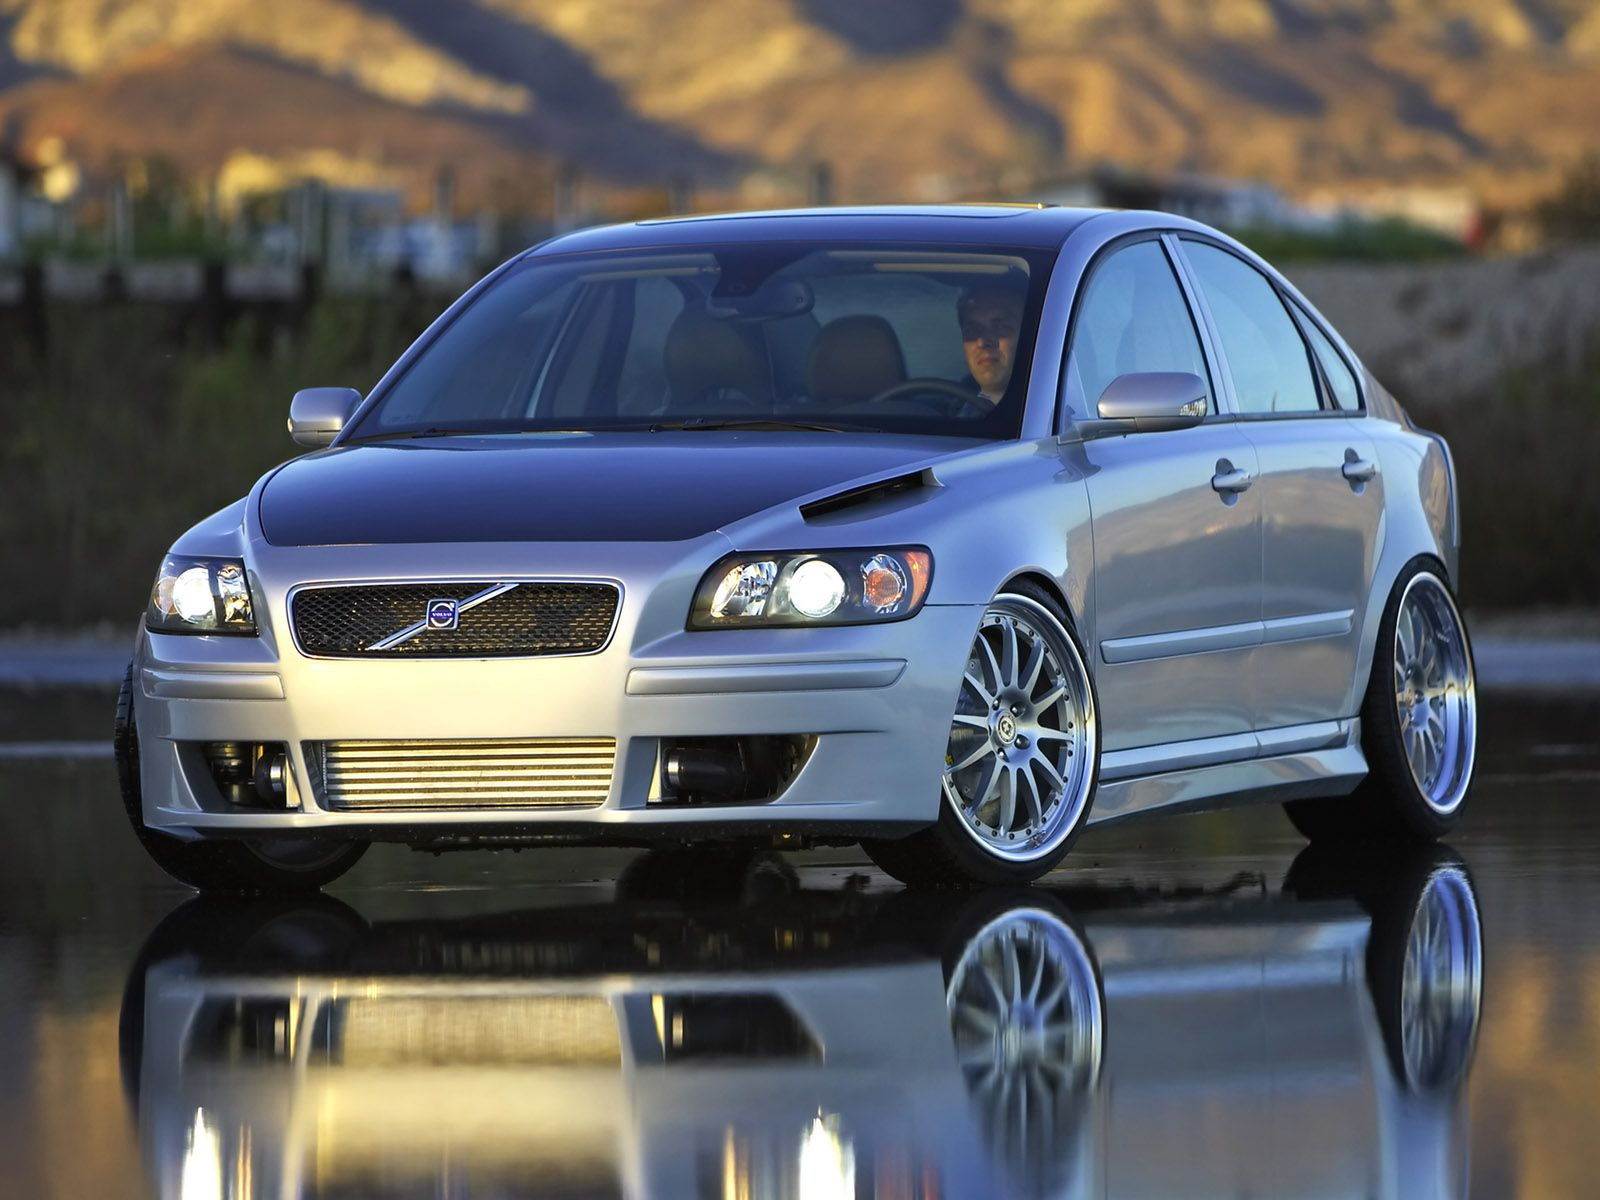 2005 Evolve Volvo S40 Sedan - Front Angle